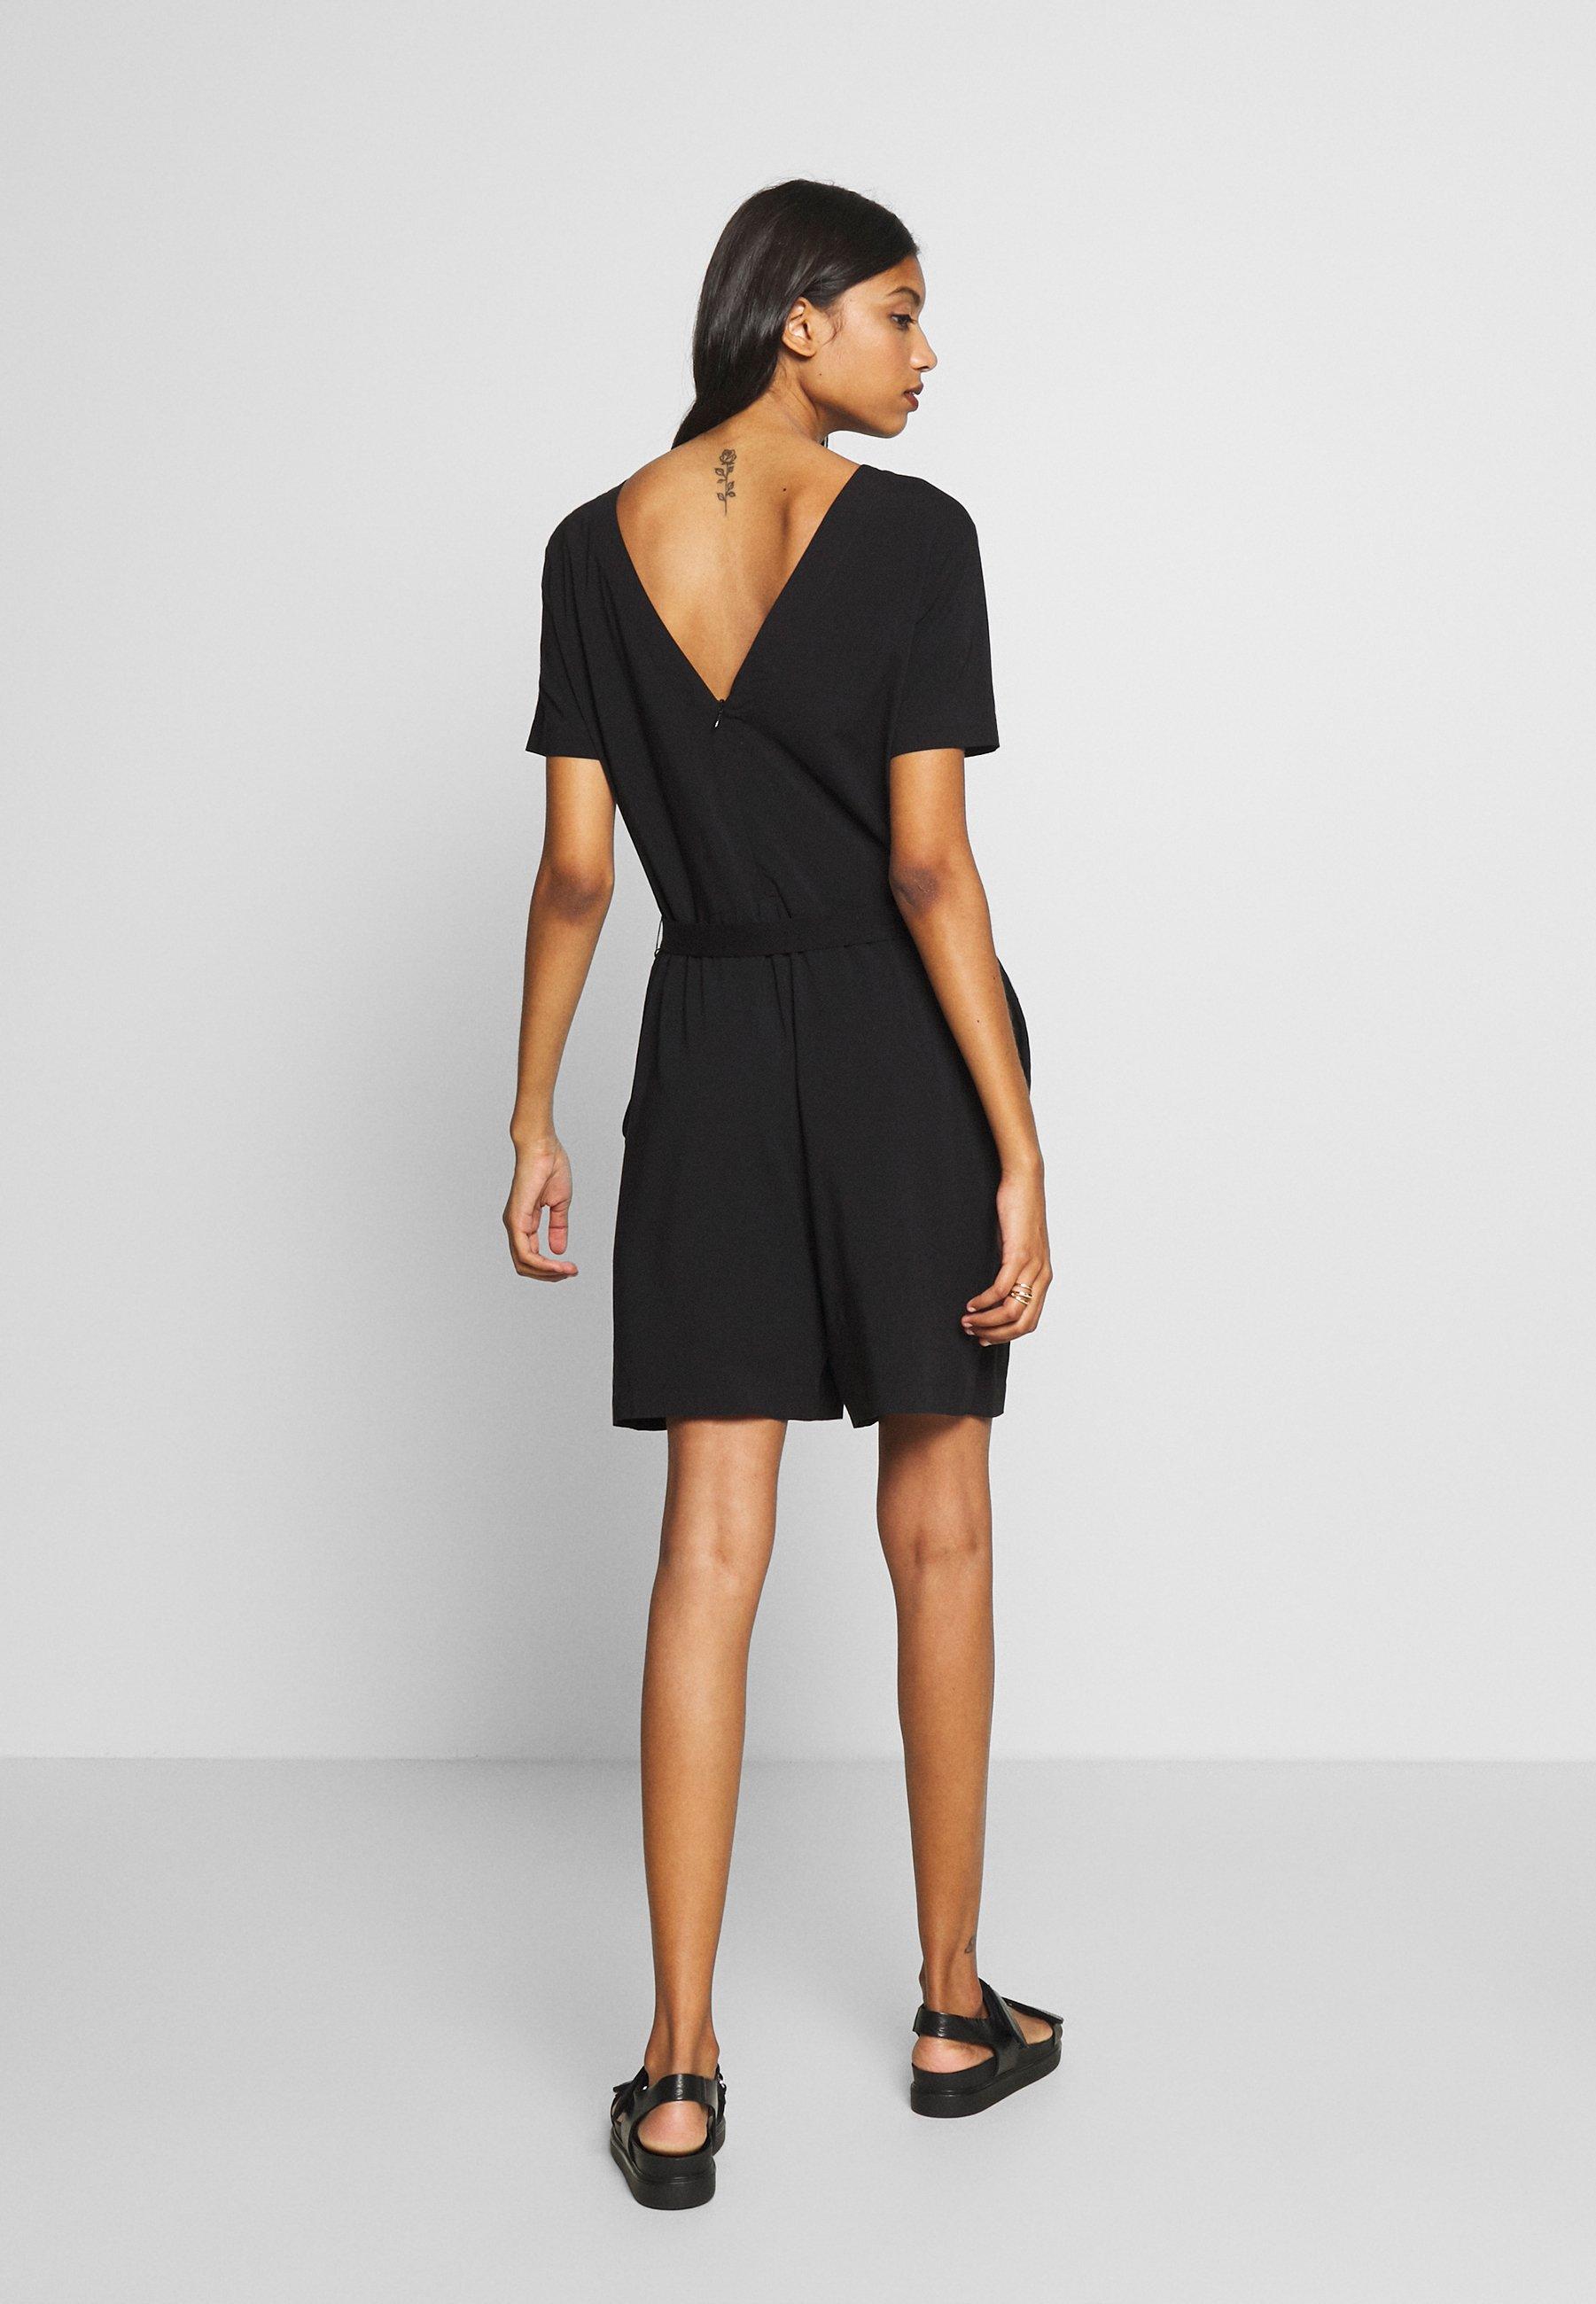 Shop For Women's Clothing Soft Rebels KATRINA PLAYSUIT Jumpsuit black xC7MYZLZ5